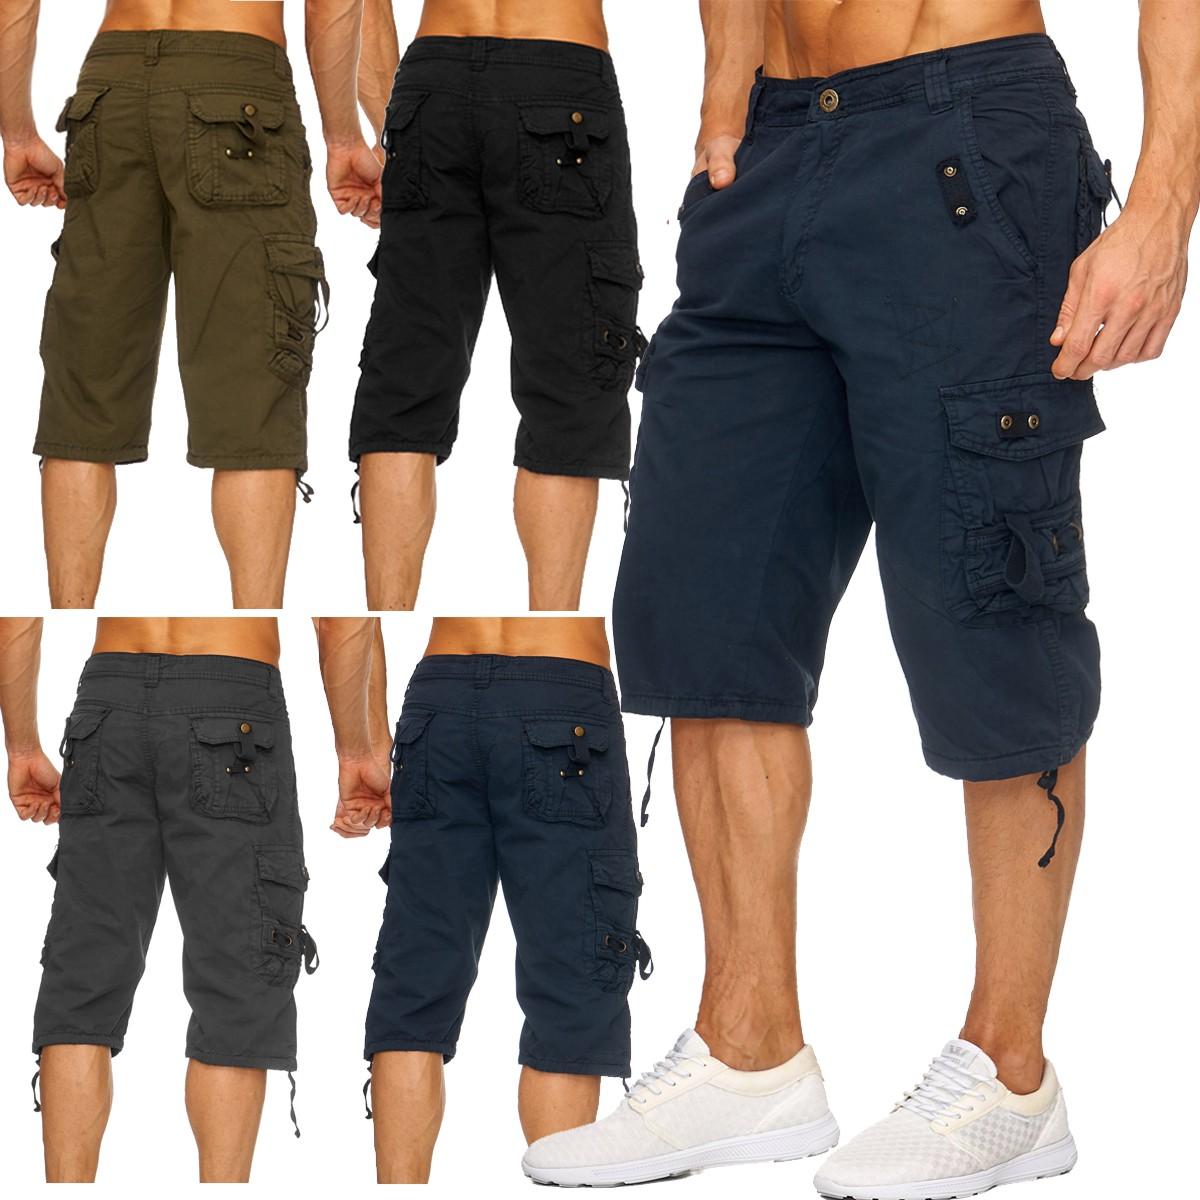 herren cargo pants sommer capri shorts bermuda 3 4 locker taschen hose kurz neu ebay. Black Bedroom Furniture Sets. Home Design Ideas